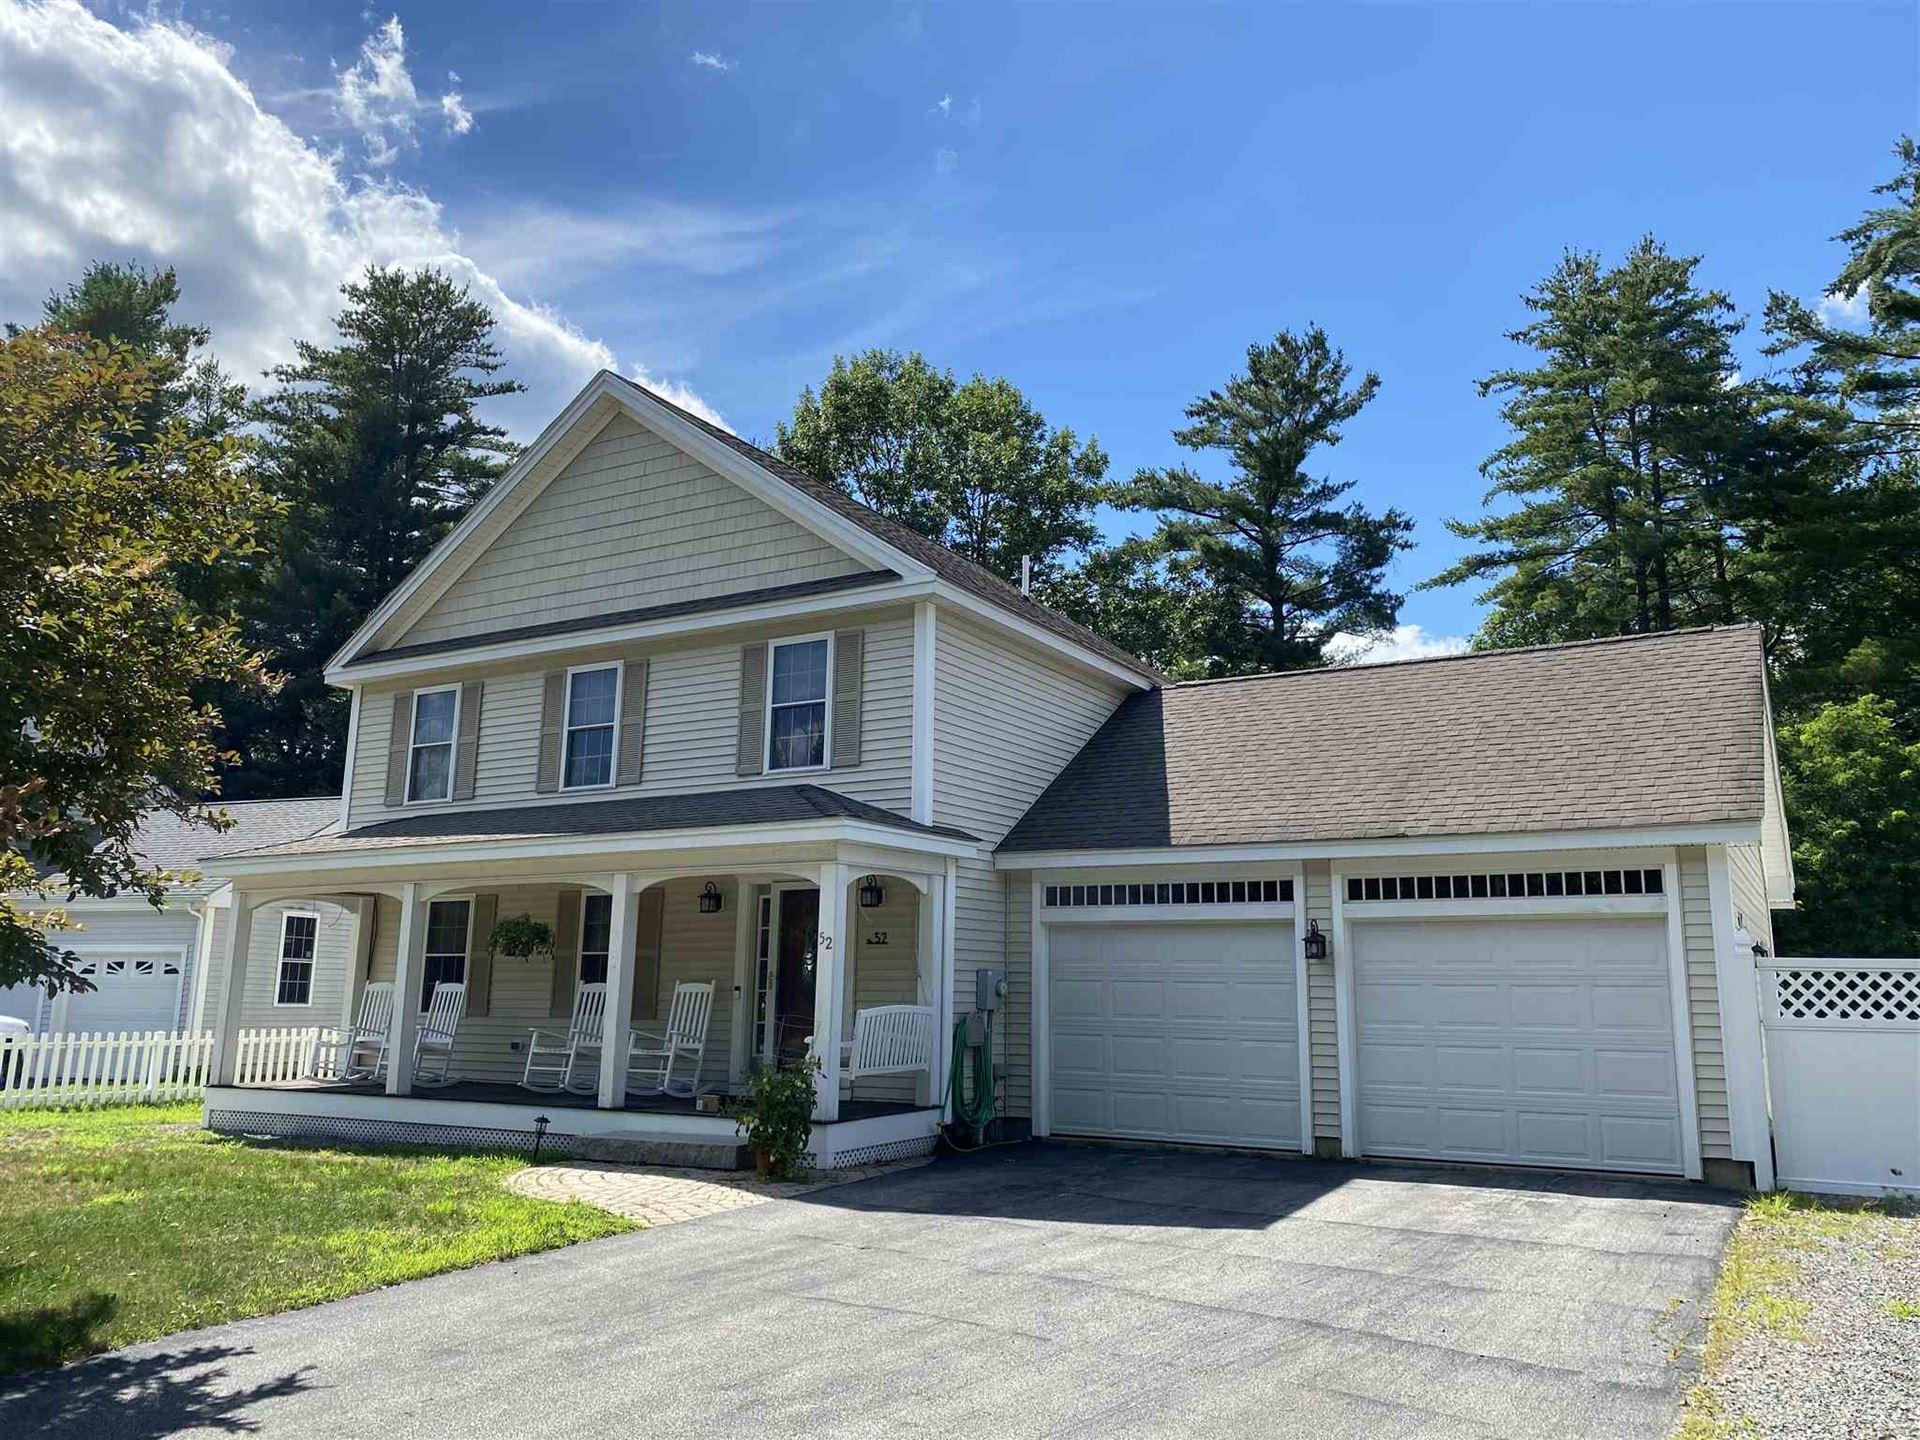 52 Millstream Lane, Concord, NH 03303 - MLS#: 4818147